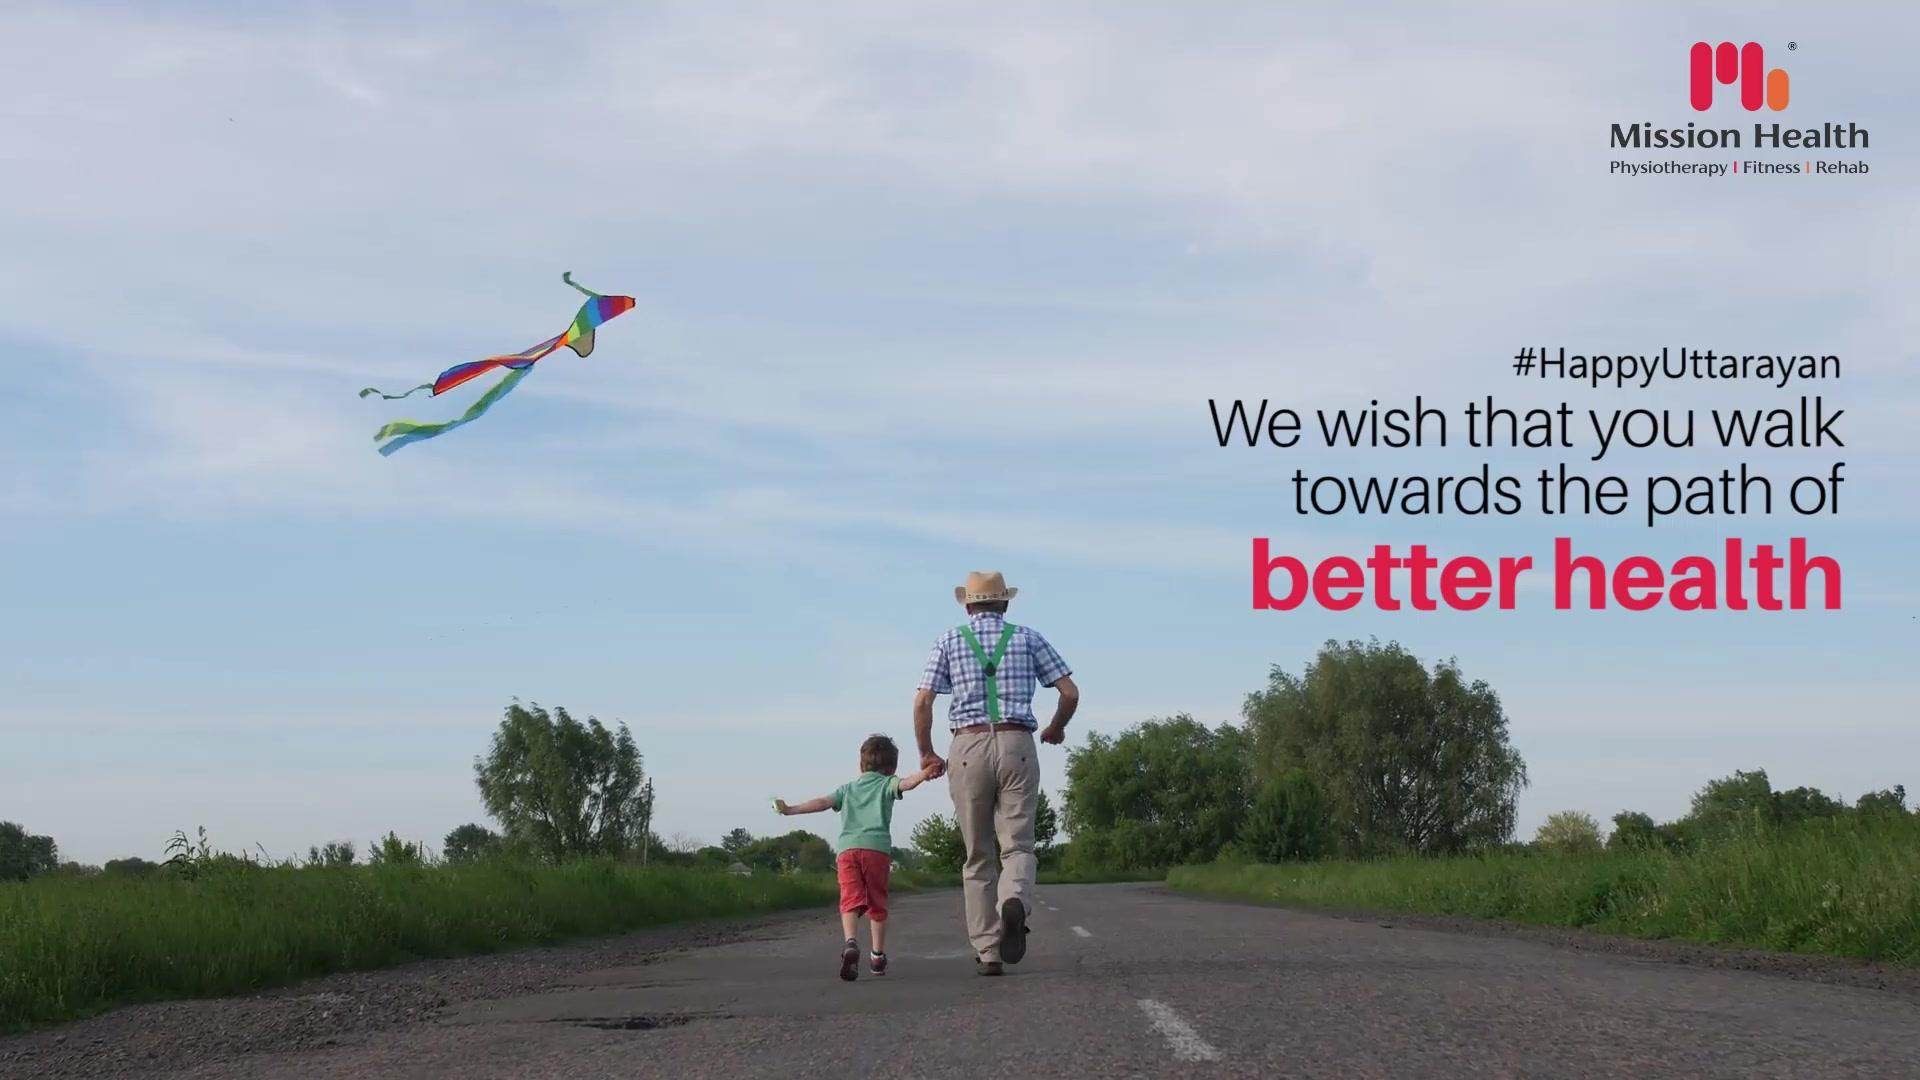 This Makar Sankranti, we wish that you walk towards the path of better health.  #HappyUttarayan #MakarSankranti2020 #MakarSankranti #Kites #KitesFestival #Uttarayan #Uttarayan2020 #KiteFlying #CelebrationTime #MissionHealth #MissionHealthIndia #MovementIsLife #AbilityClinic